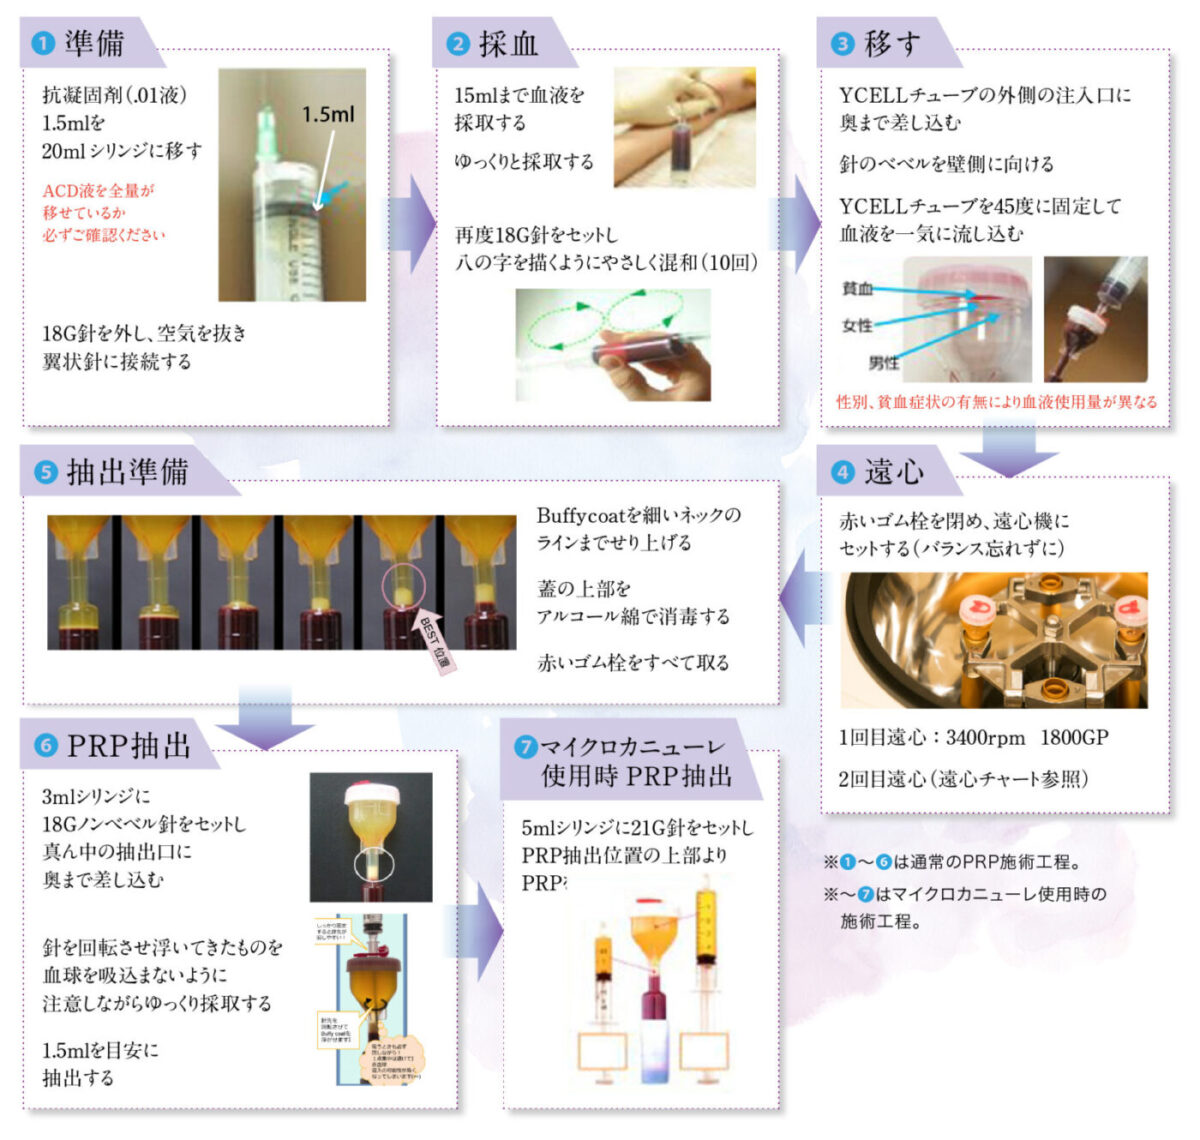 PRP血漿説明図